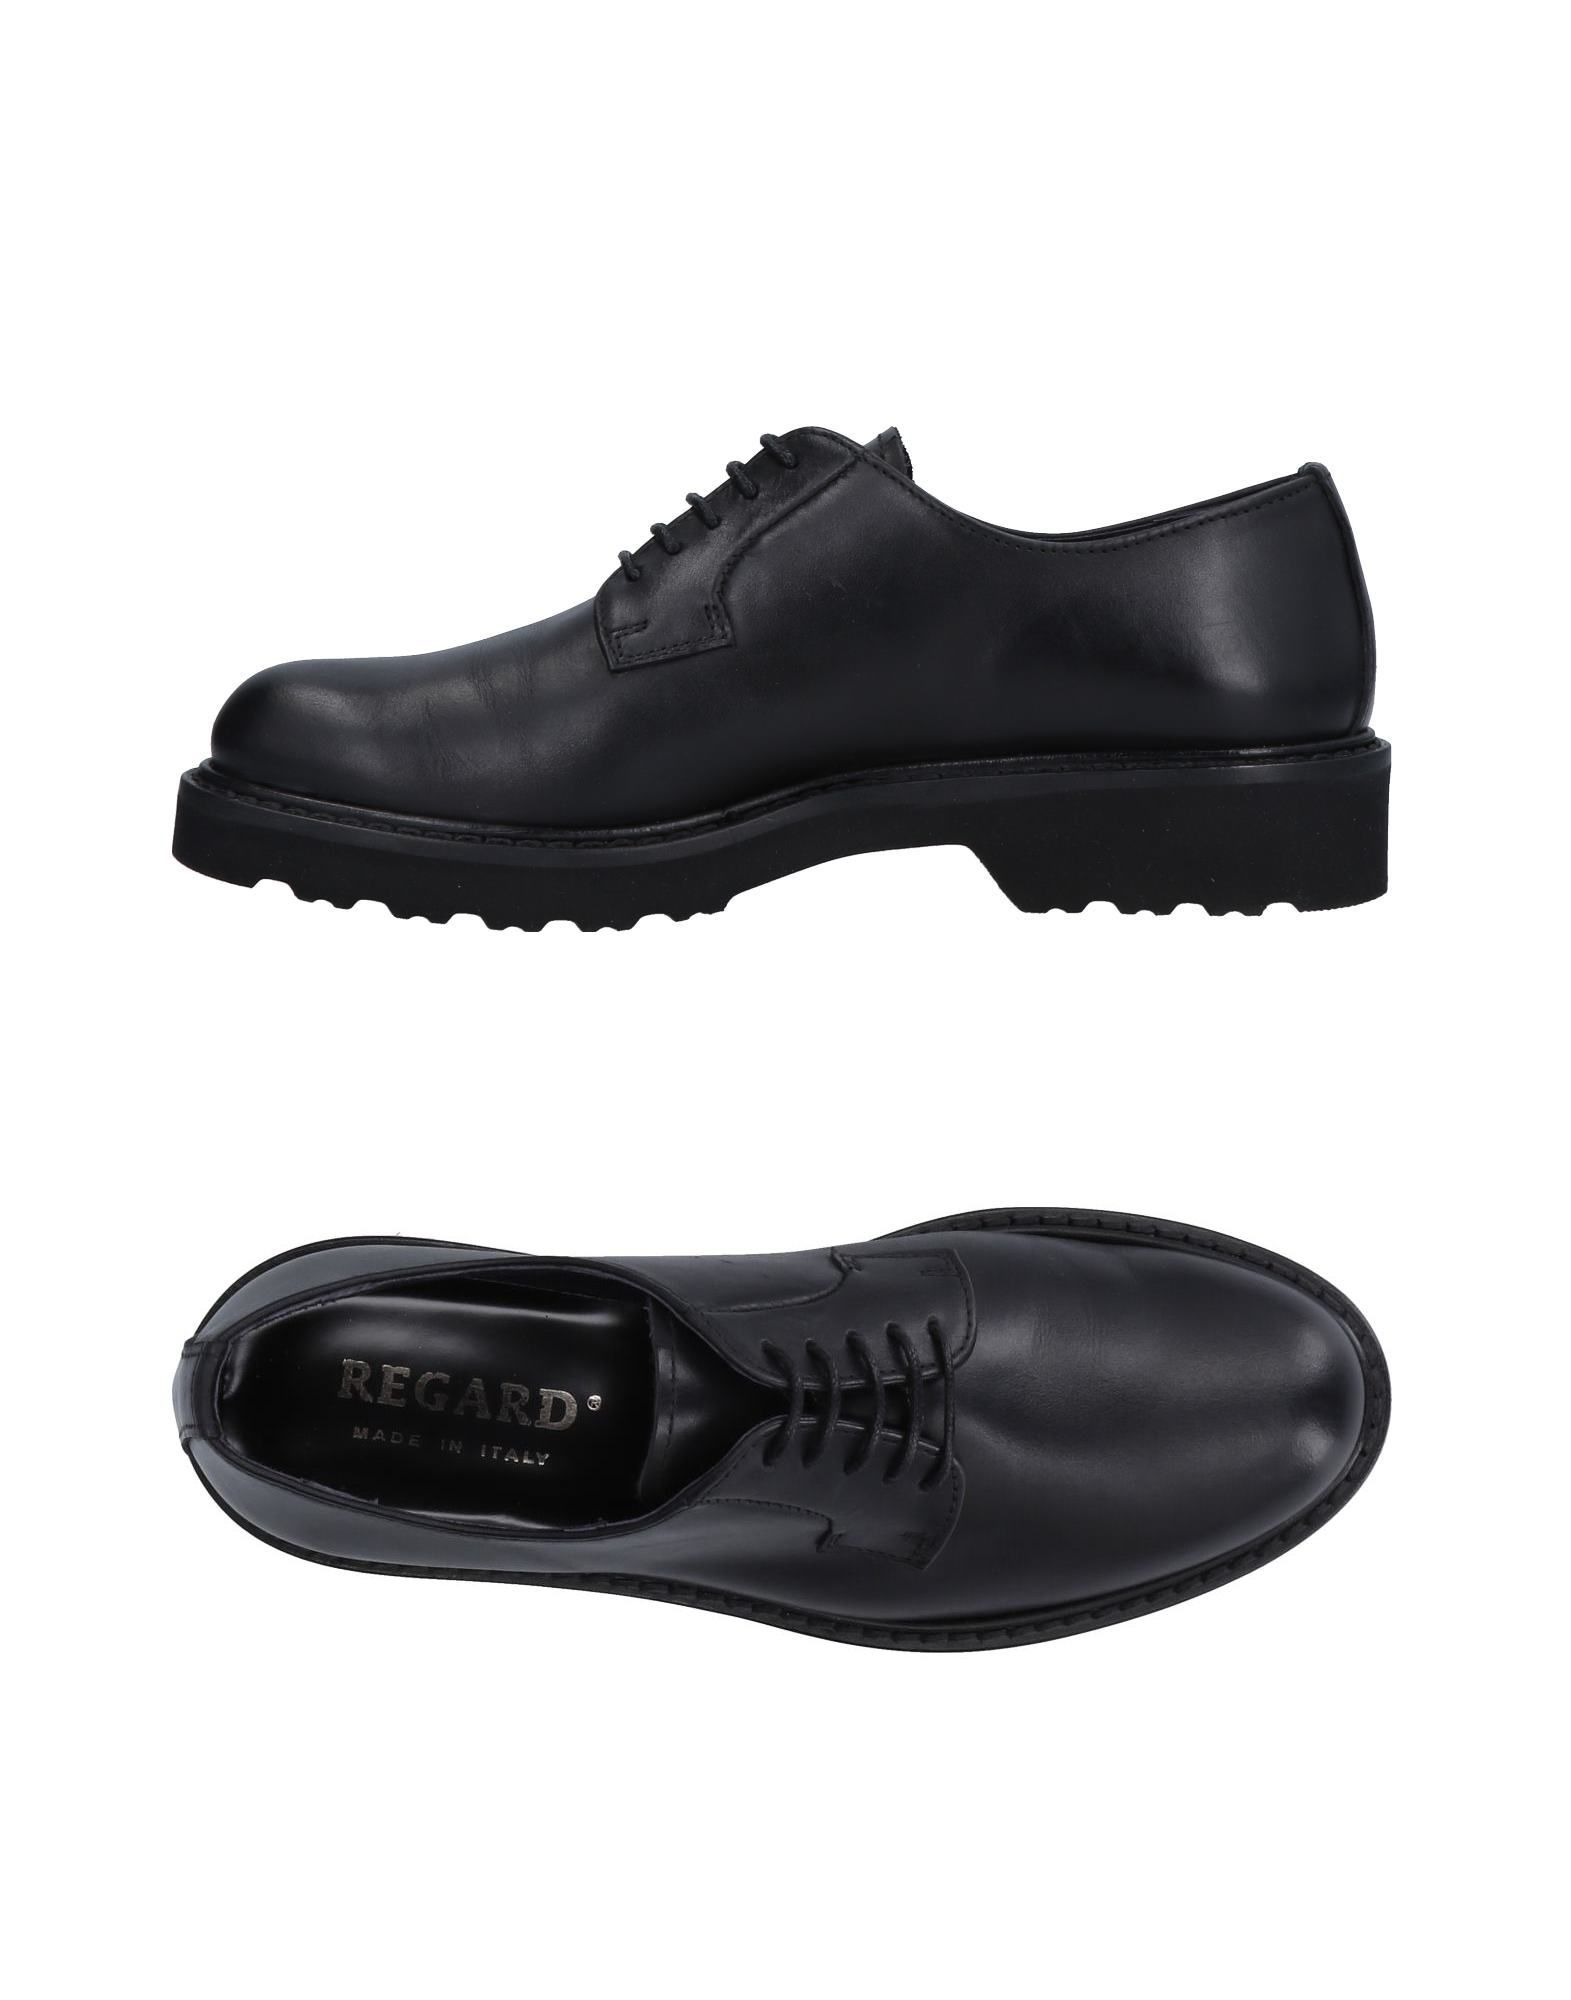 Regard Schnürschuhe Damen  11502329UO Gute Qualität beliebte Schuhe